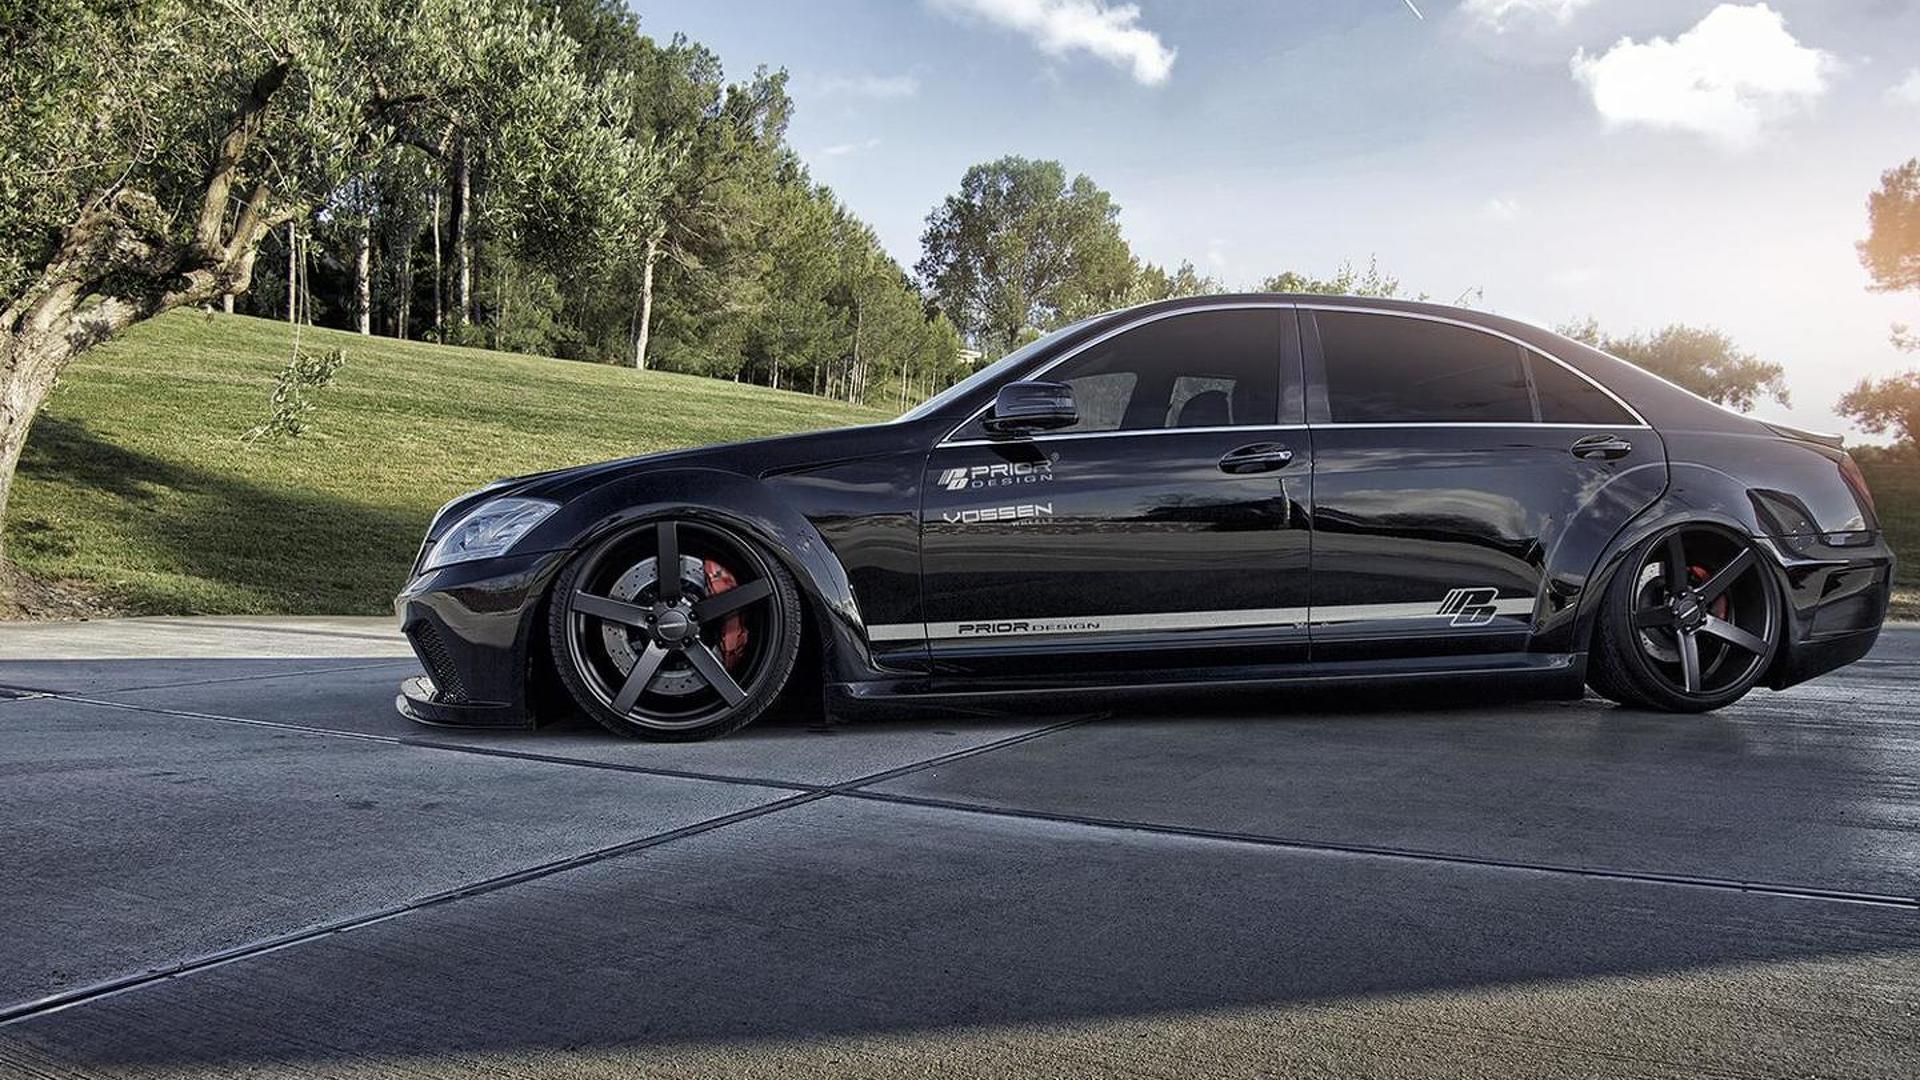 1afa868258cfeb Previous-gen Mercedes-Benz S-Class gains wide bodykit from Prior Design